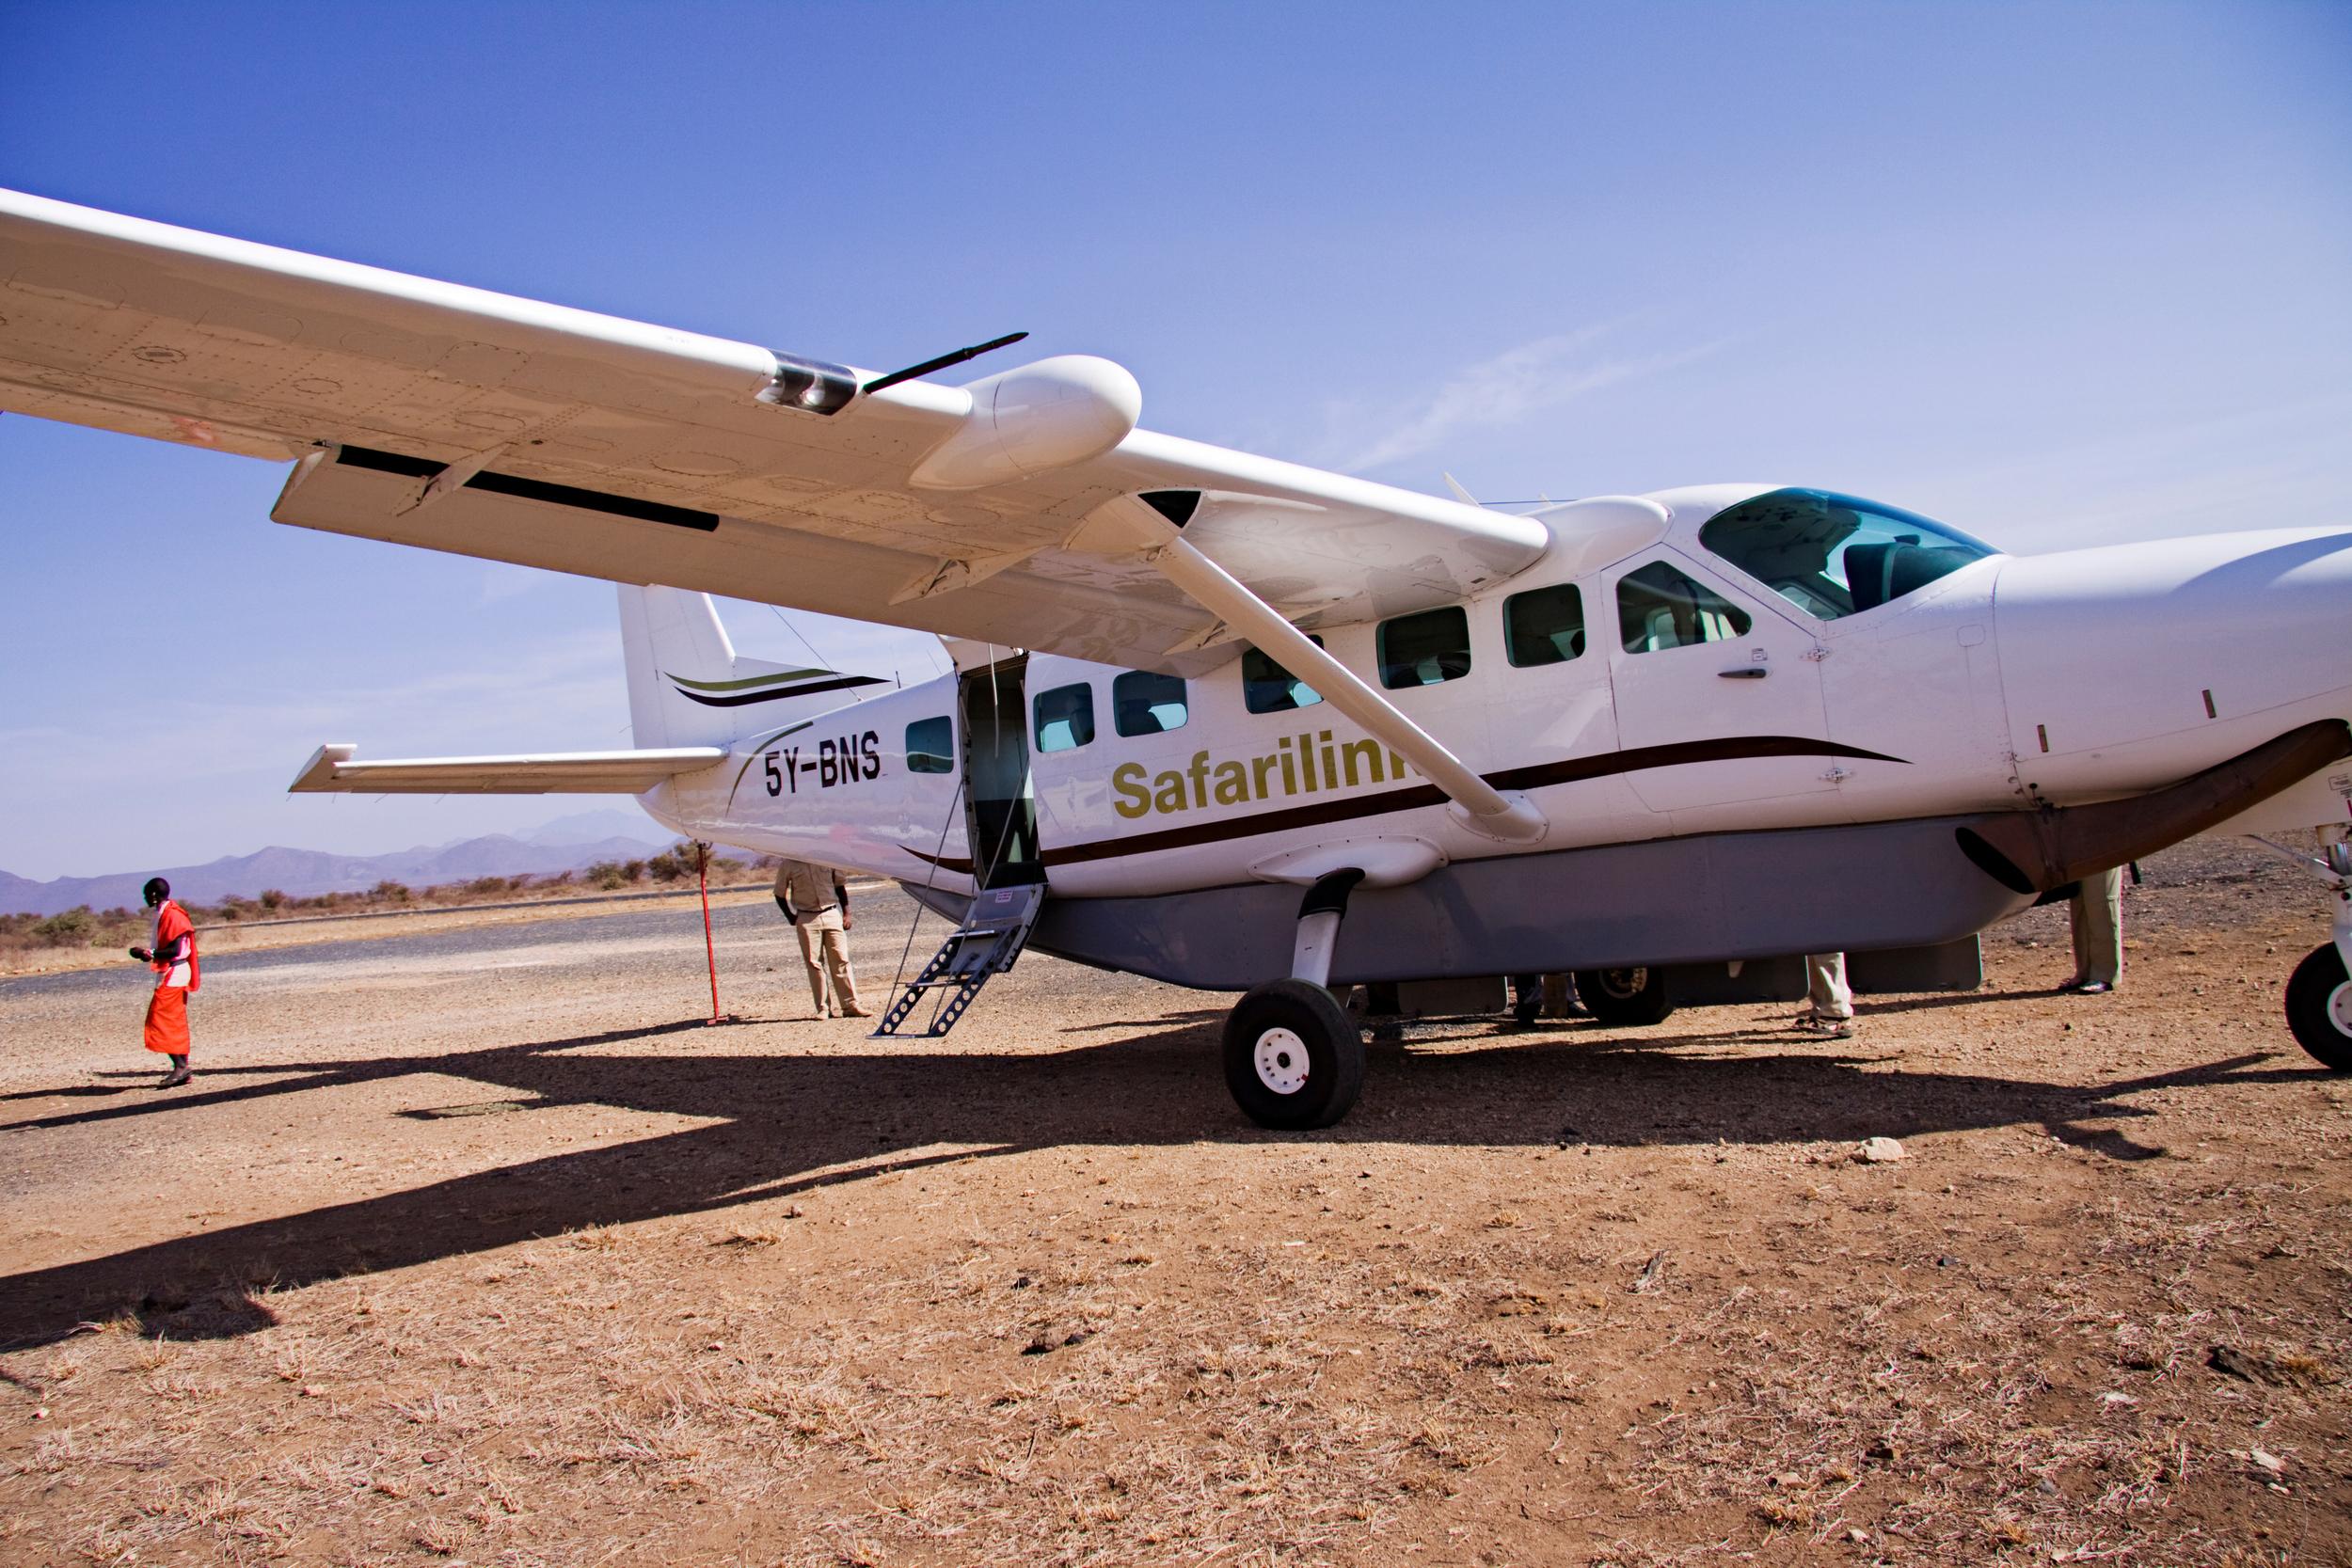 Plane from Nairobi to Samburu National Park